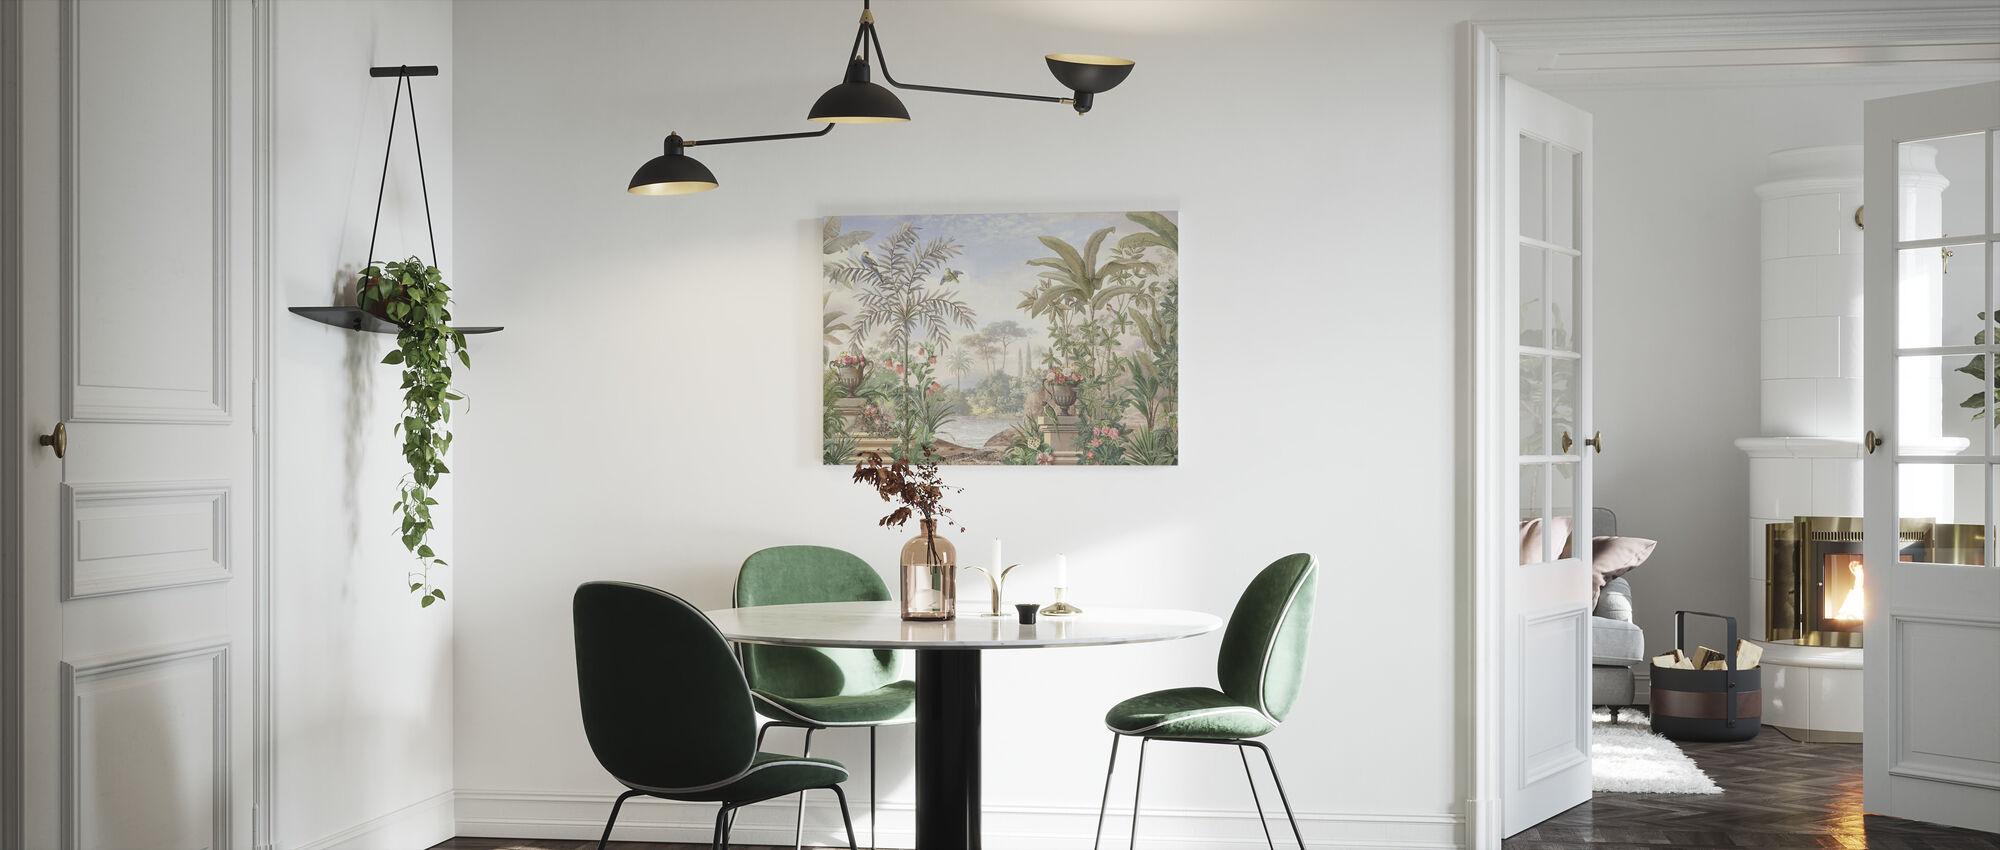 Tropical Patio - Canvas print - Kitchen